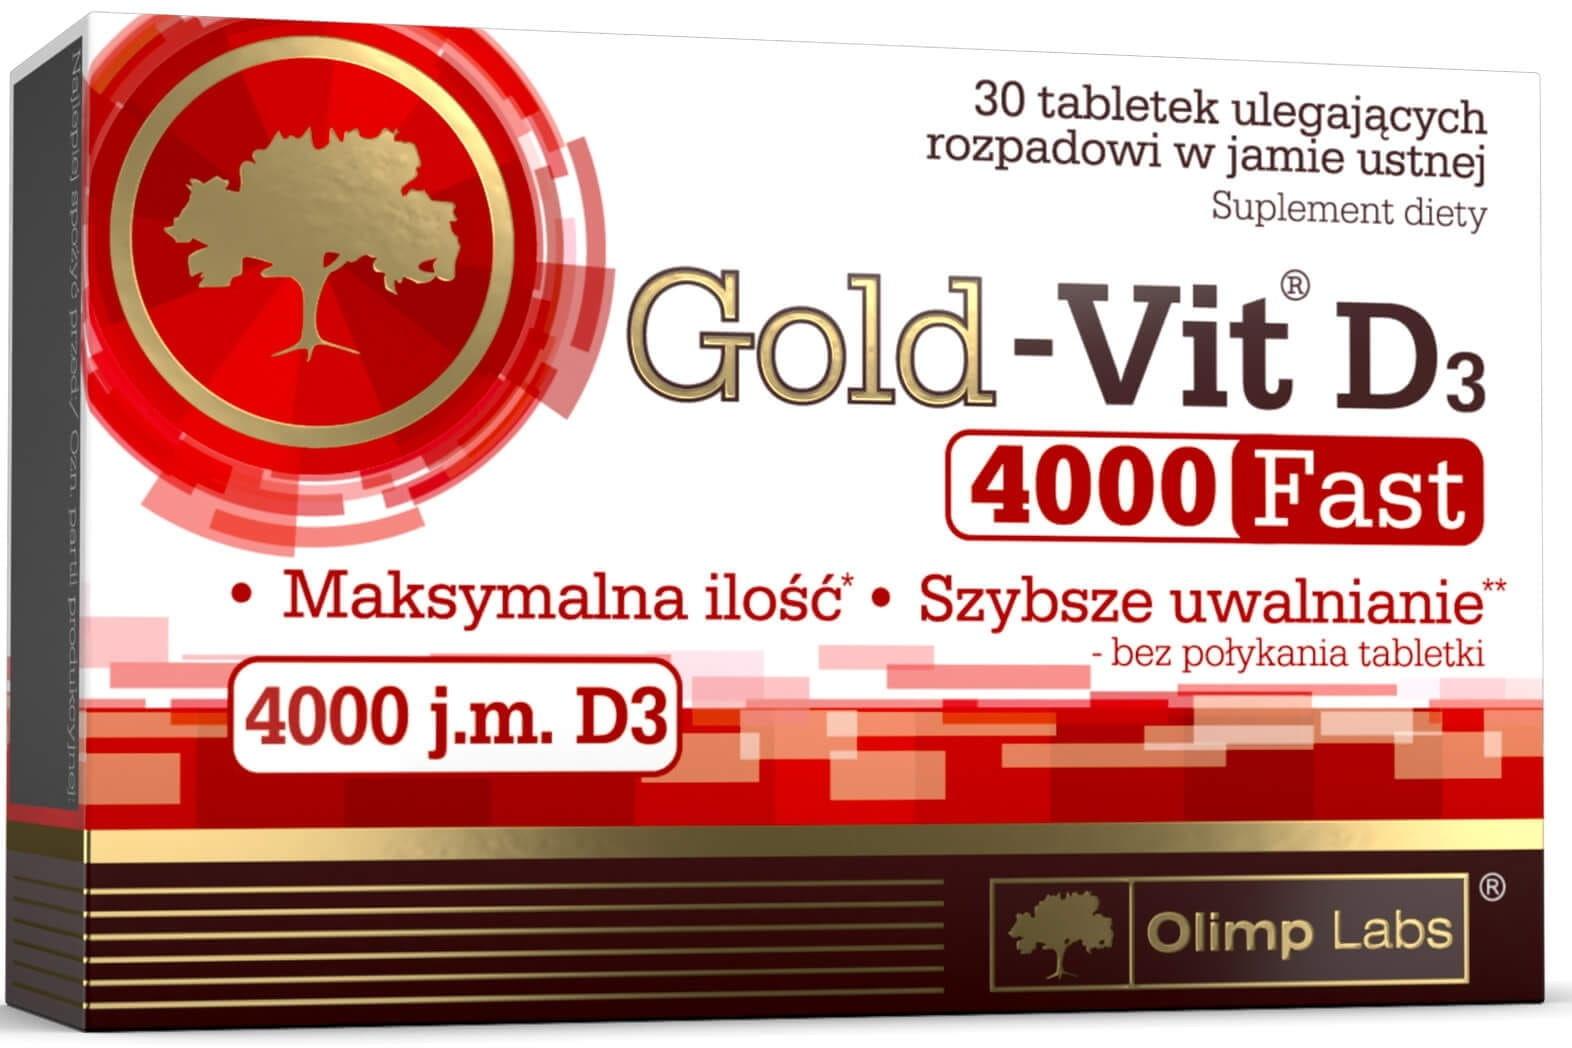 Gold-Vit D3 Fast 4000 IU Suplement Diety 30 Tabletek - Olimp Labs